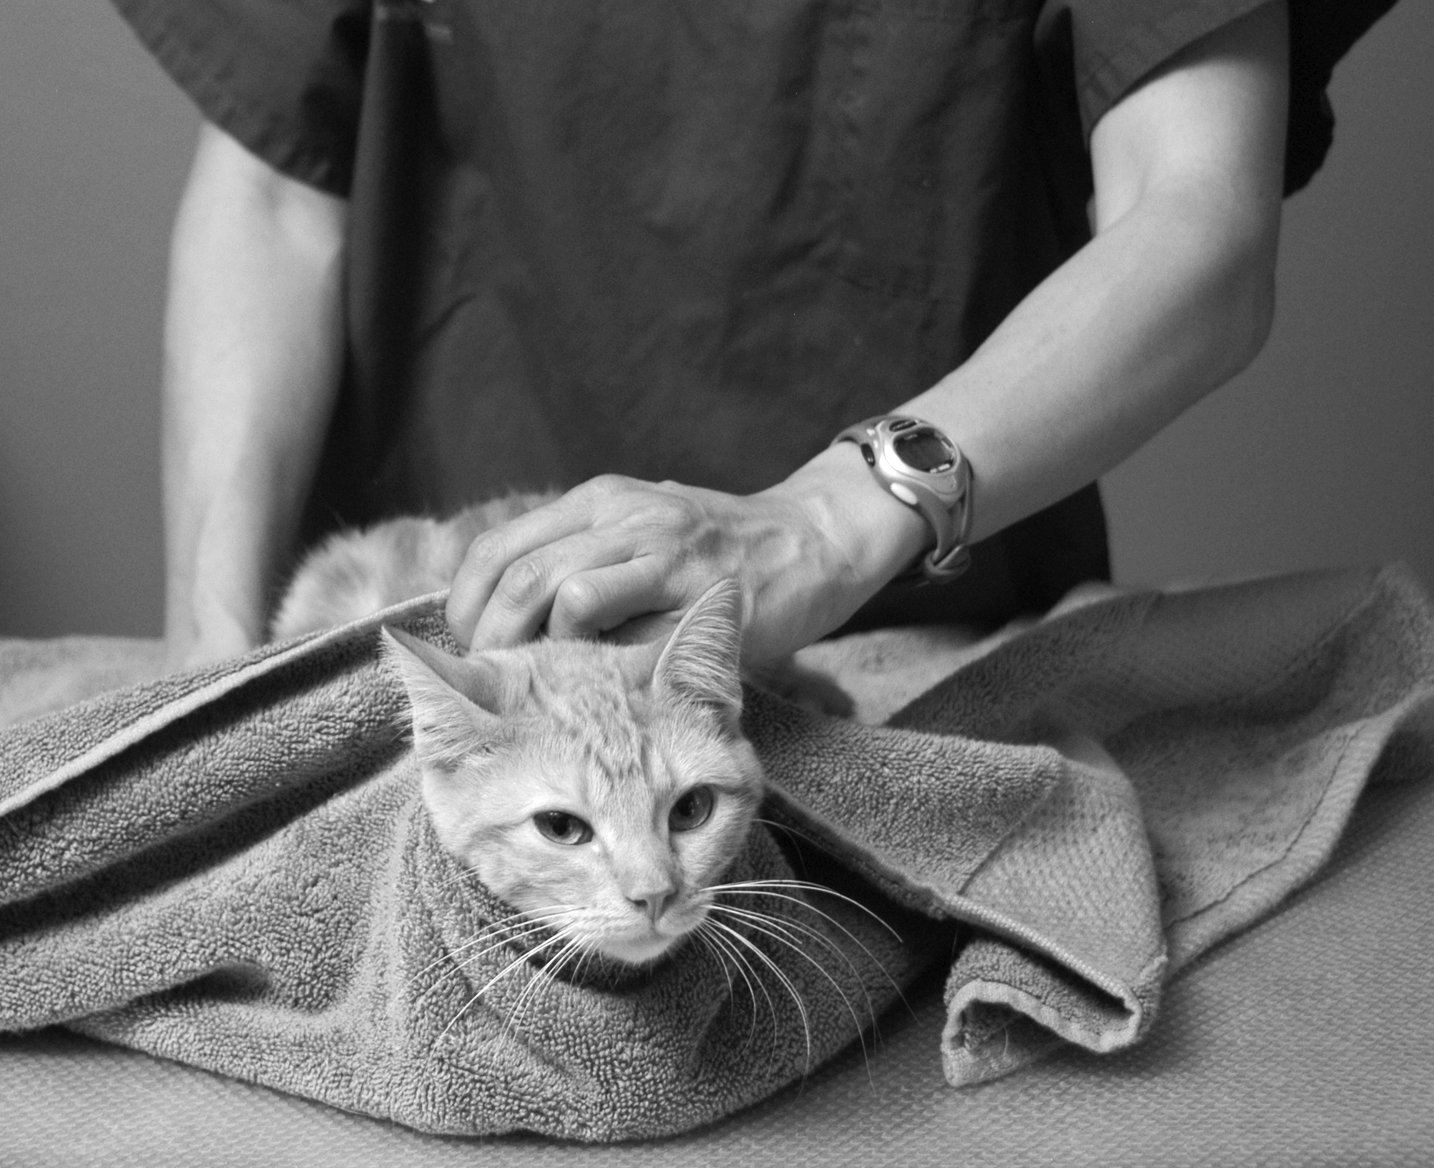 giving cat medication